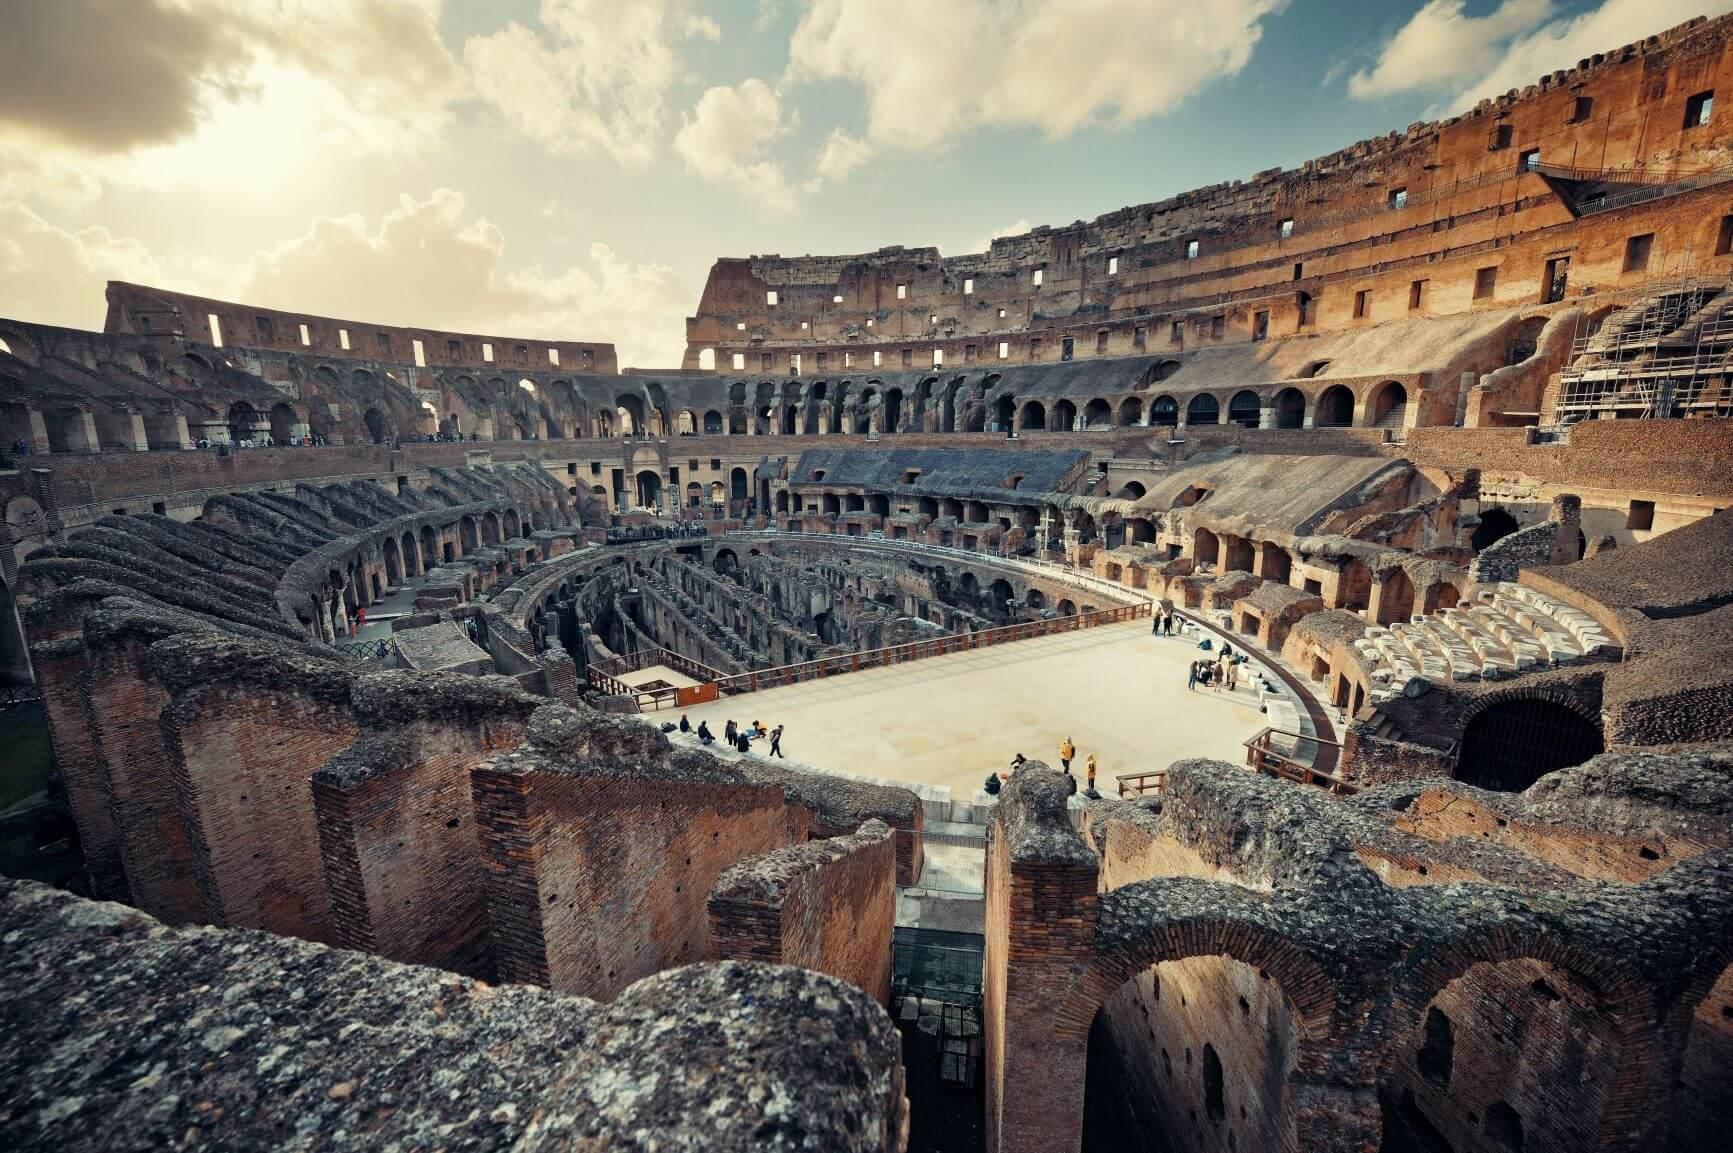 Circus Maximus Experience